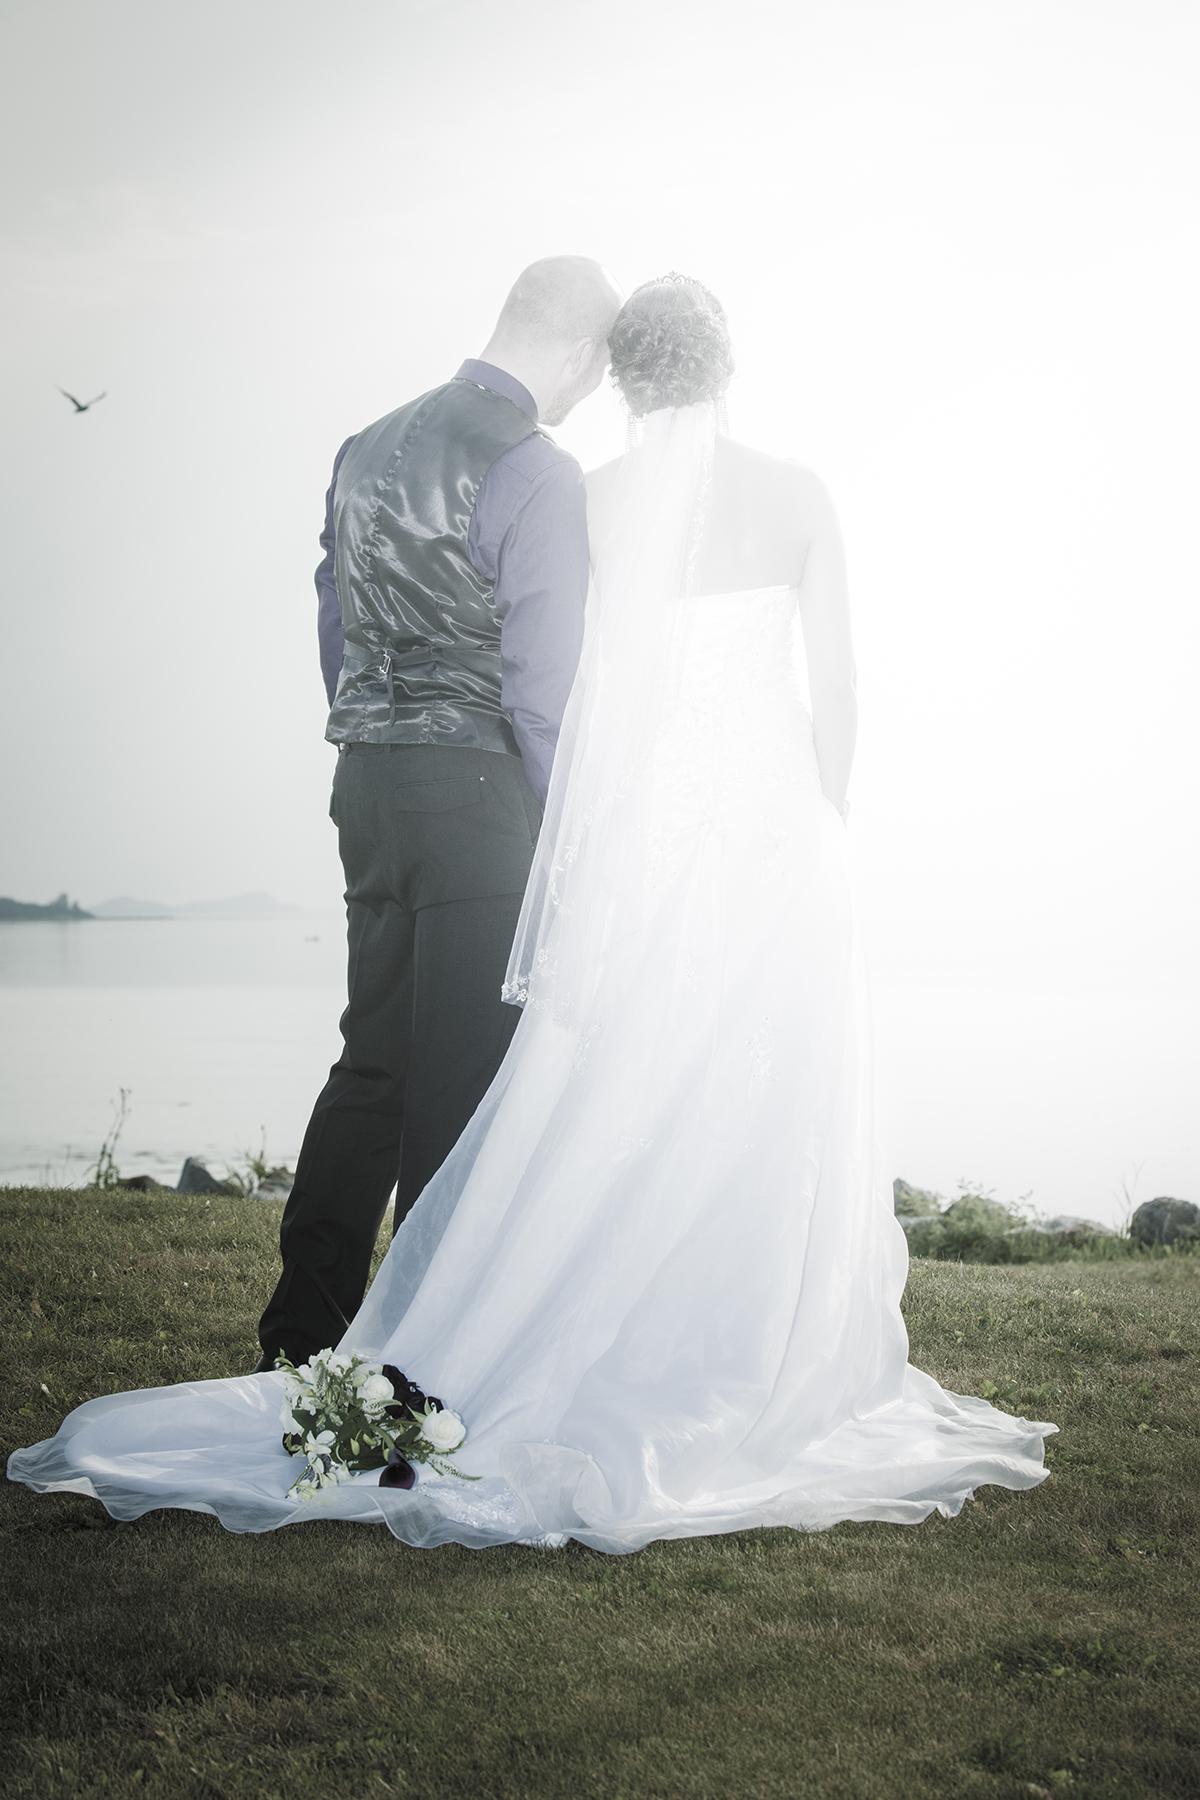 FolioPhoto-Mariage-Couple-11-ART.JPG